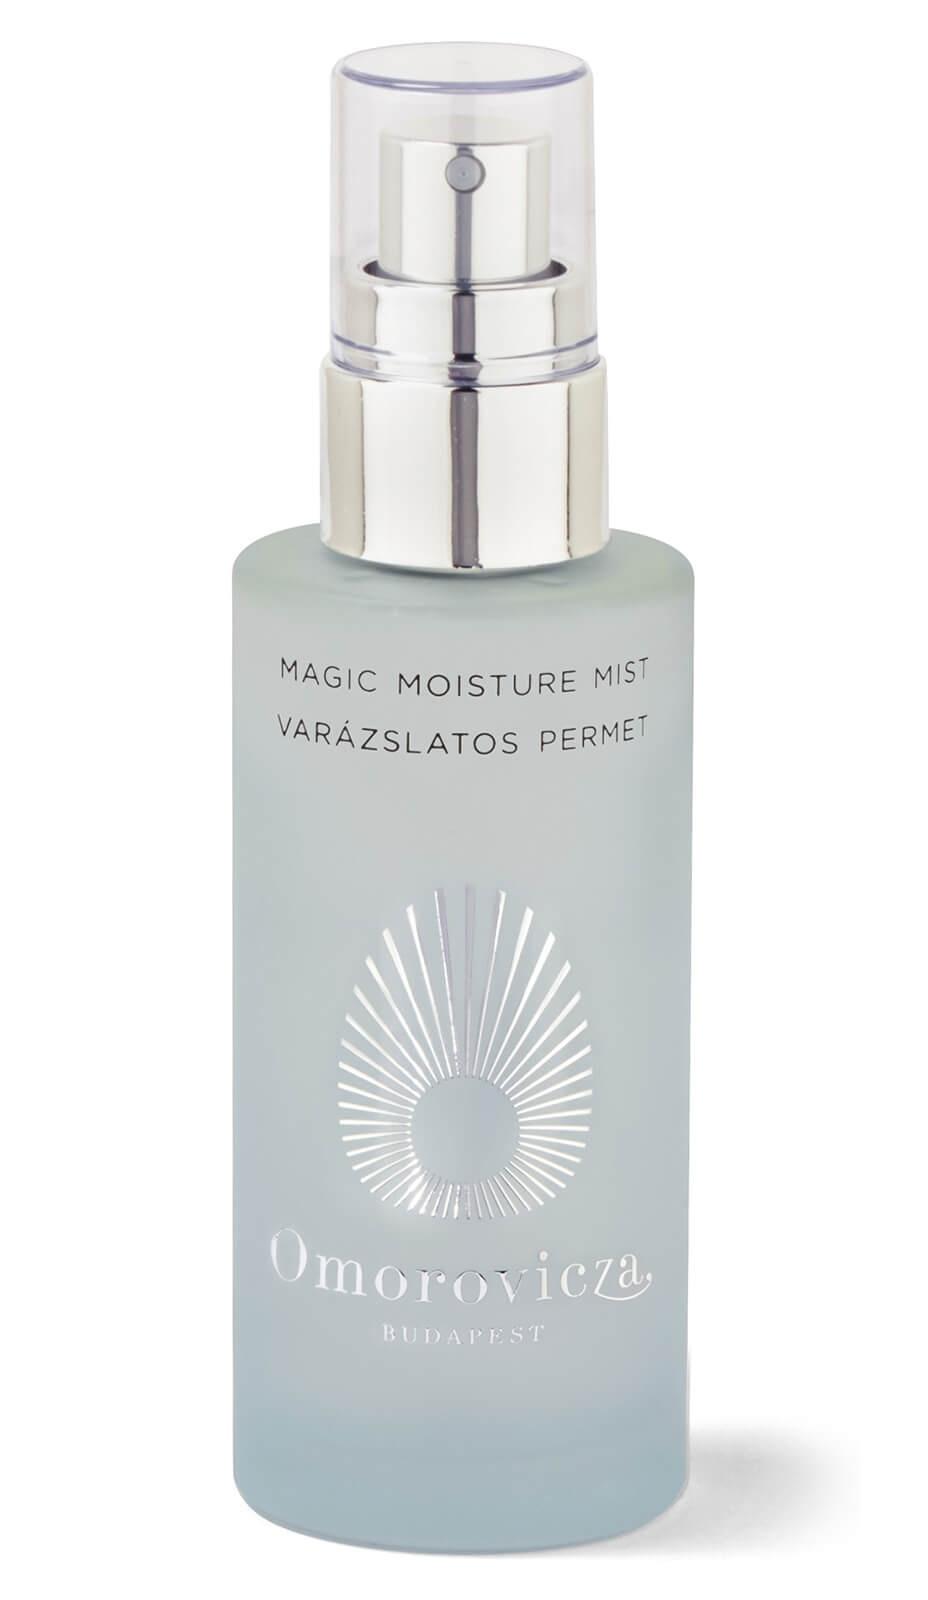 Omorovicza Magic Moisture Mist